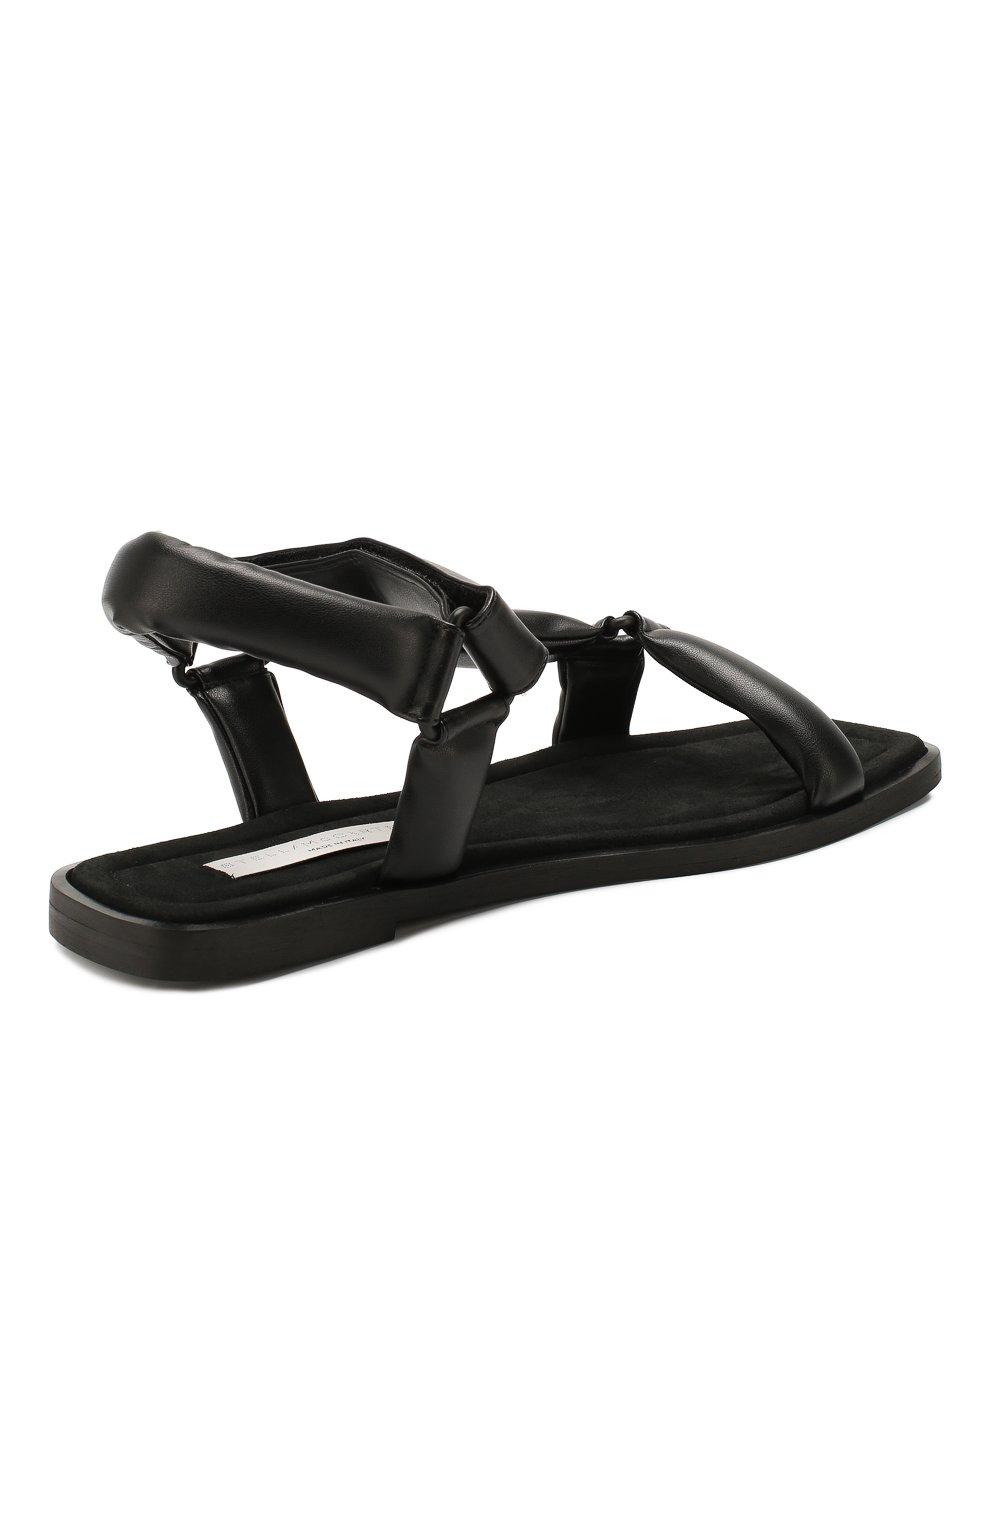 Женские сандалии STELLA MCCARTNEY черного цвета, арт. 800181/N0096 | Фото 4